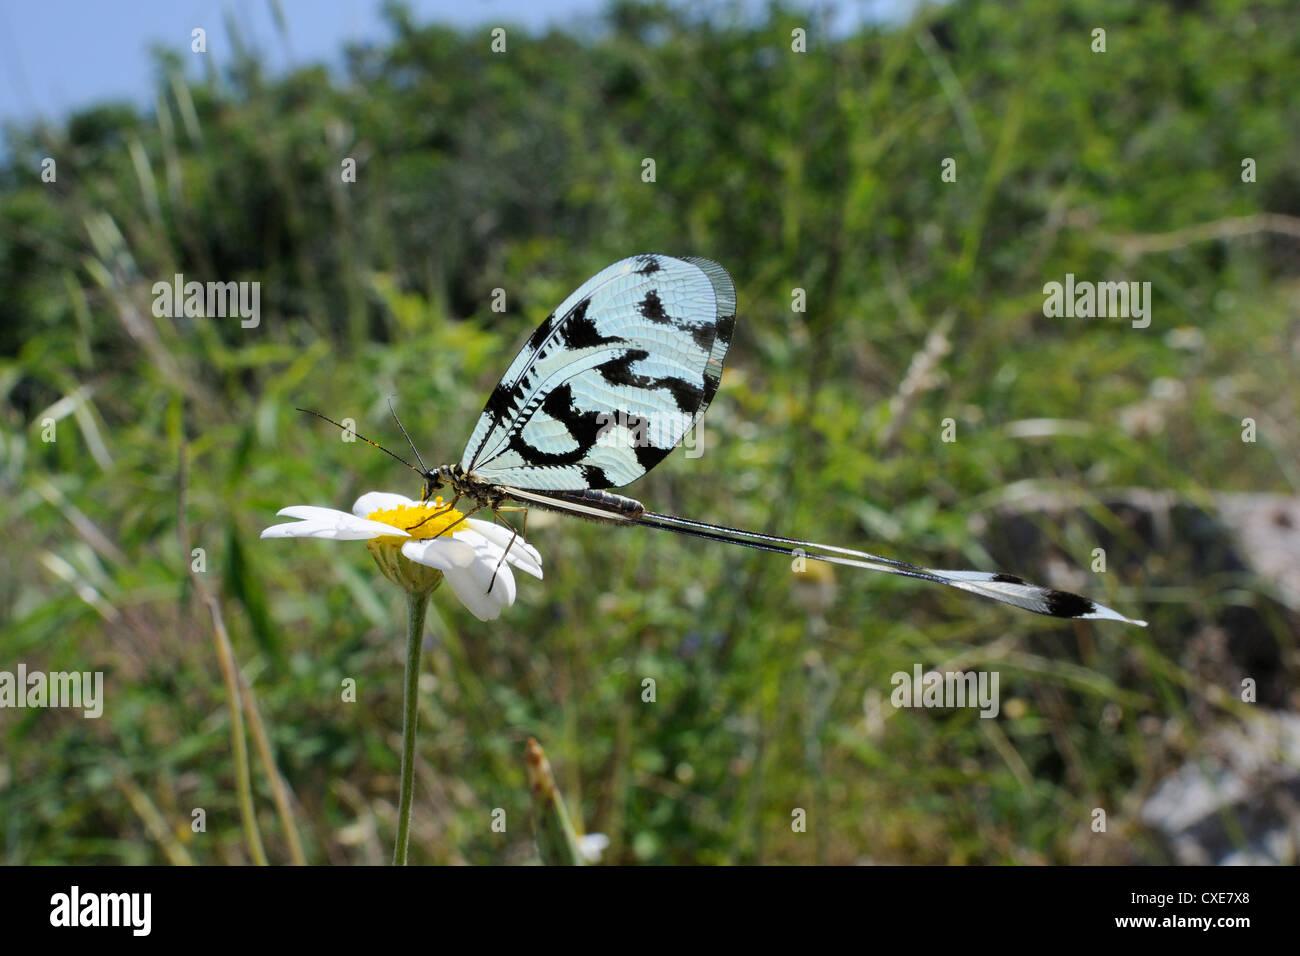 Rosca o lacewing Spoonwing lacewing alada (Nemoptera sinuata) alimentación en ojo de buey margarita (Leucanthemum vulgare), Lesbos, Grecia Foto de stock